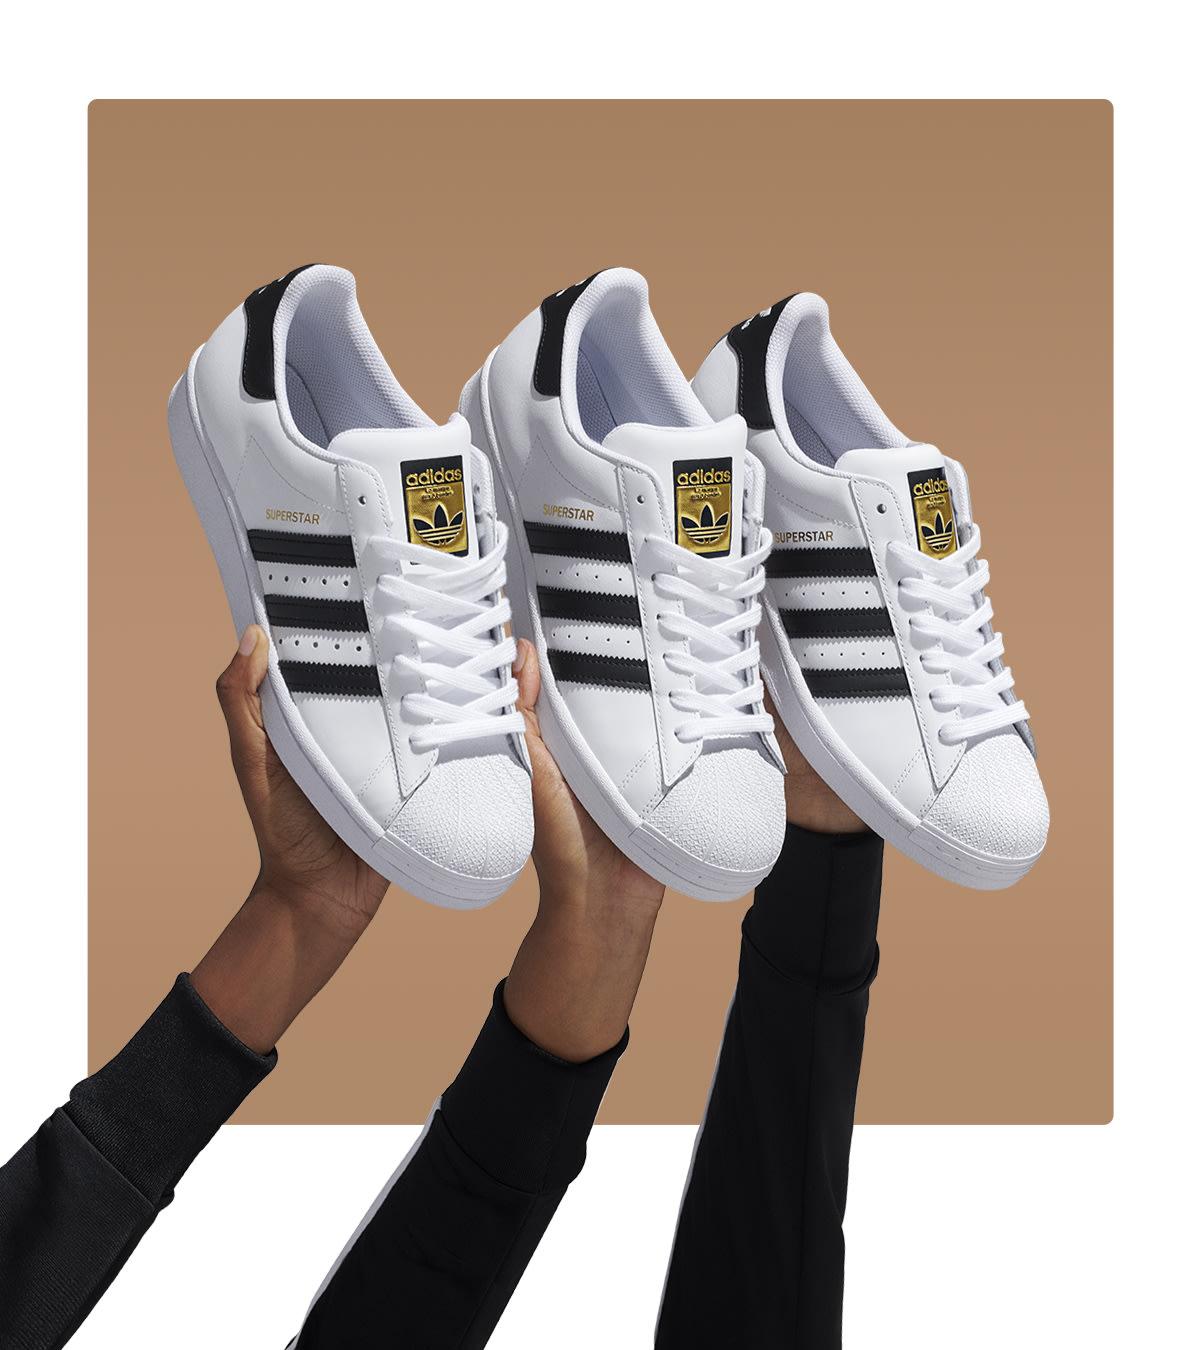 Originals Sneakers & Clothing| adidas Germany